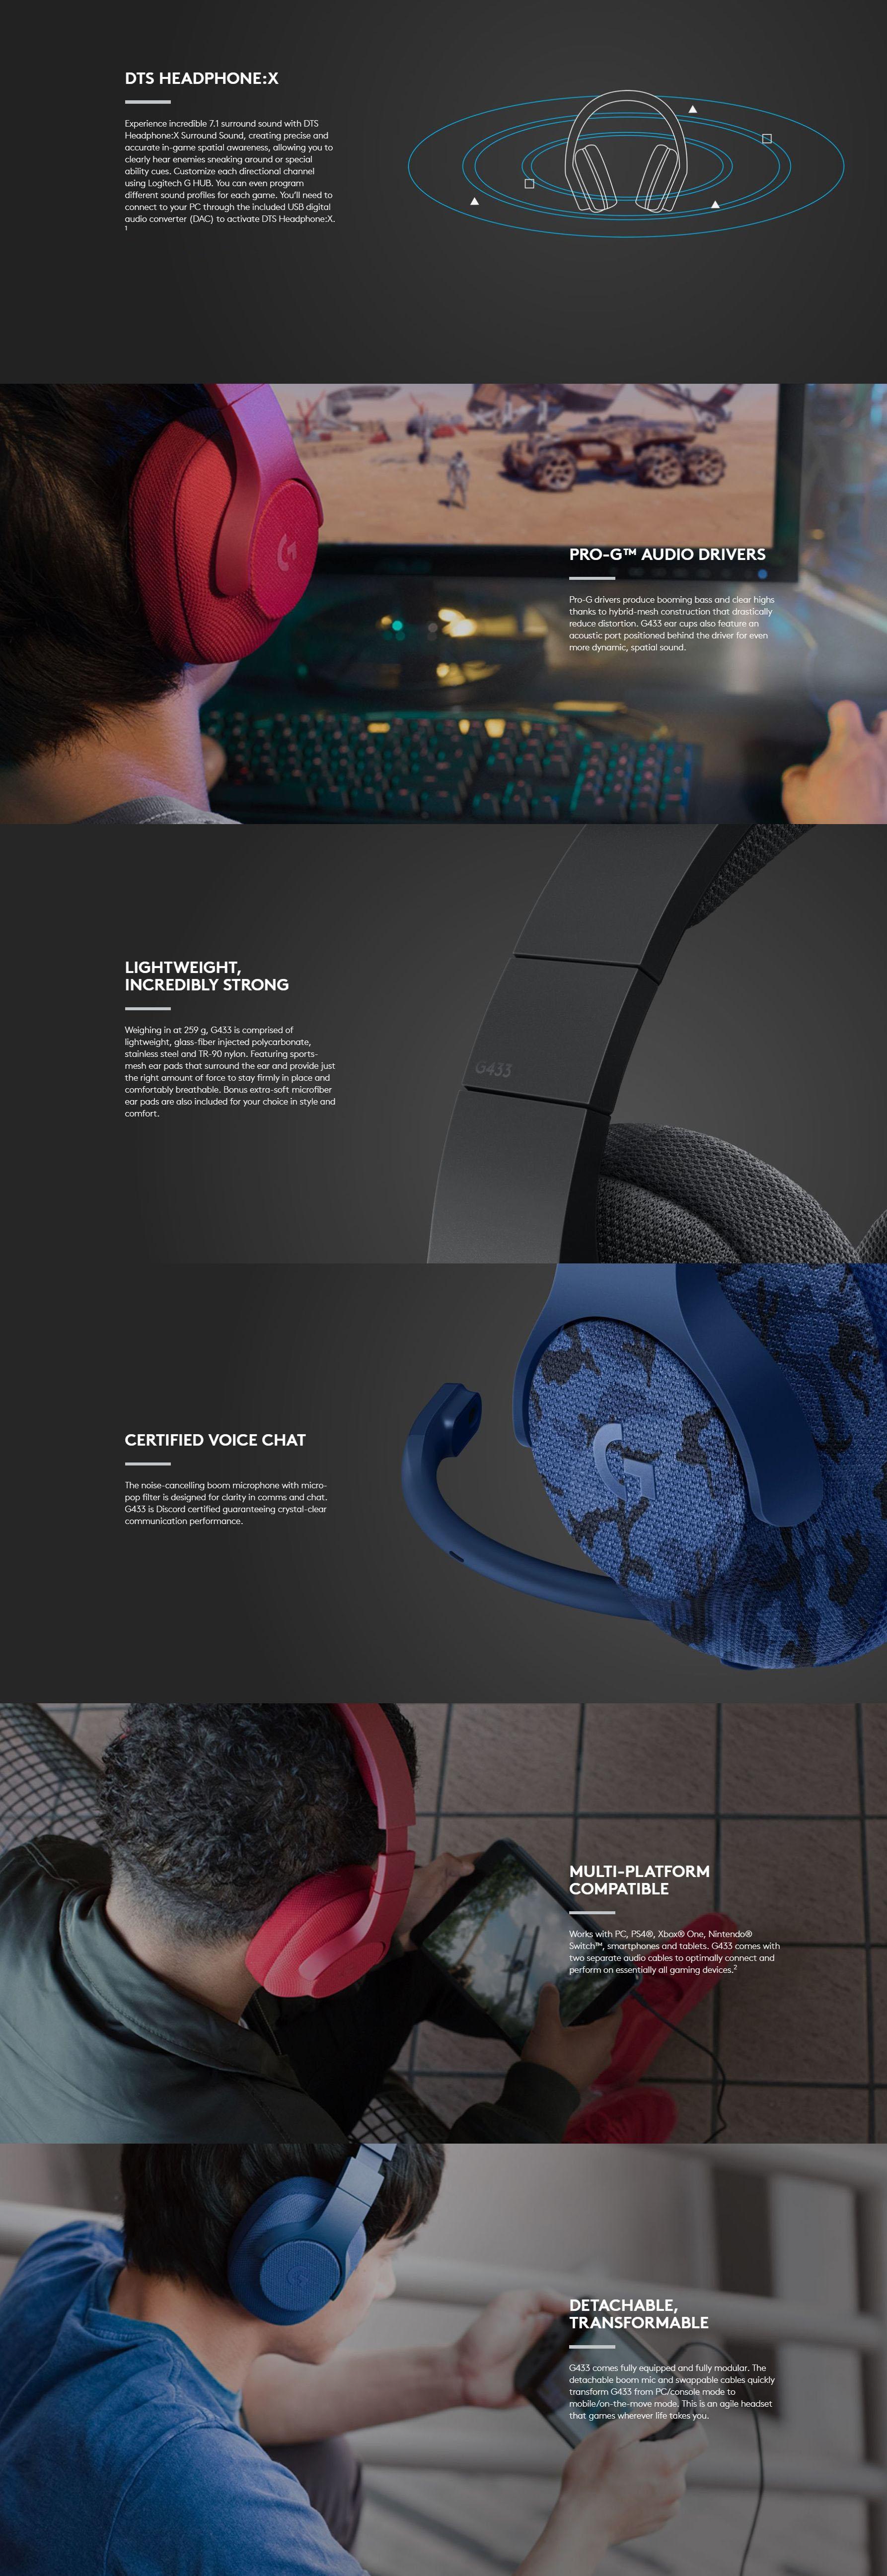 Logitech G433 7 1 Gaming Headset - Black